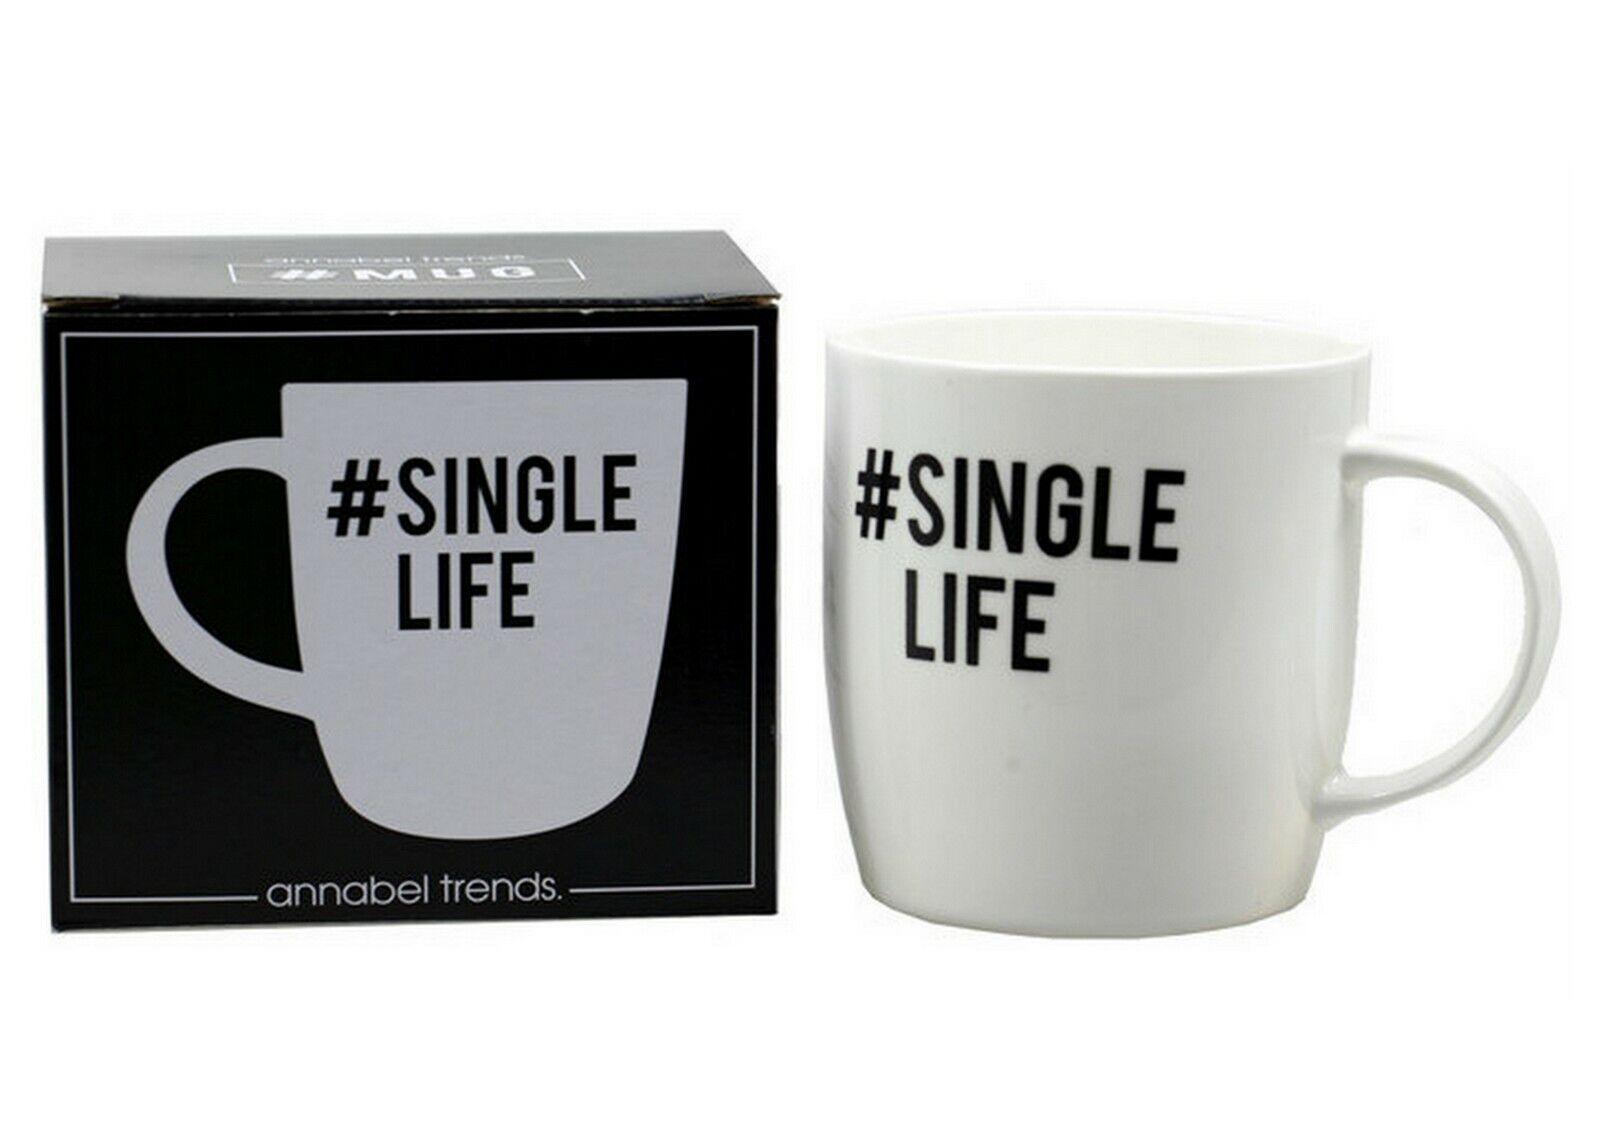 SINGLE LIFE COFFEE MUG SINGLELIFE TEA HOT CHOCOLATE DRINK CUP HIPSTER GIFT